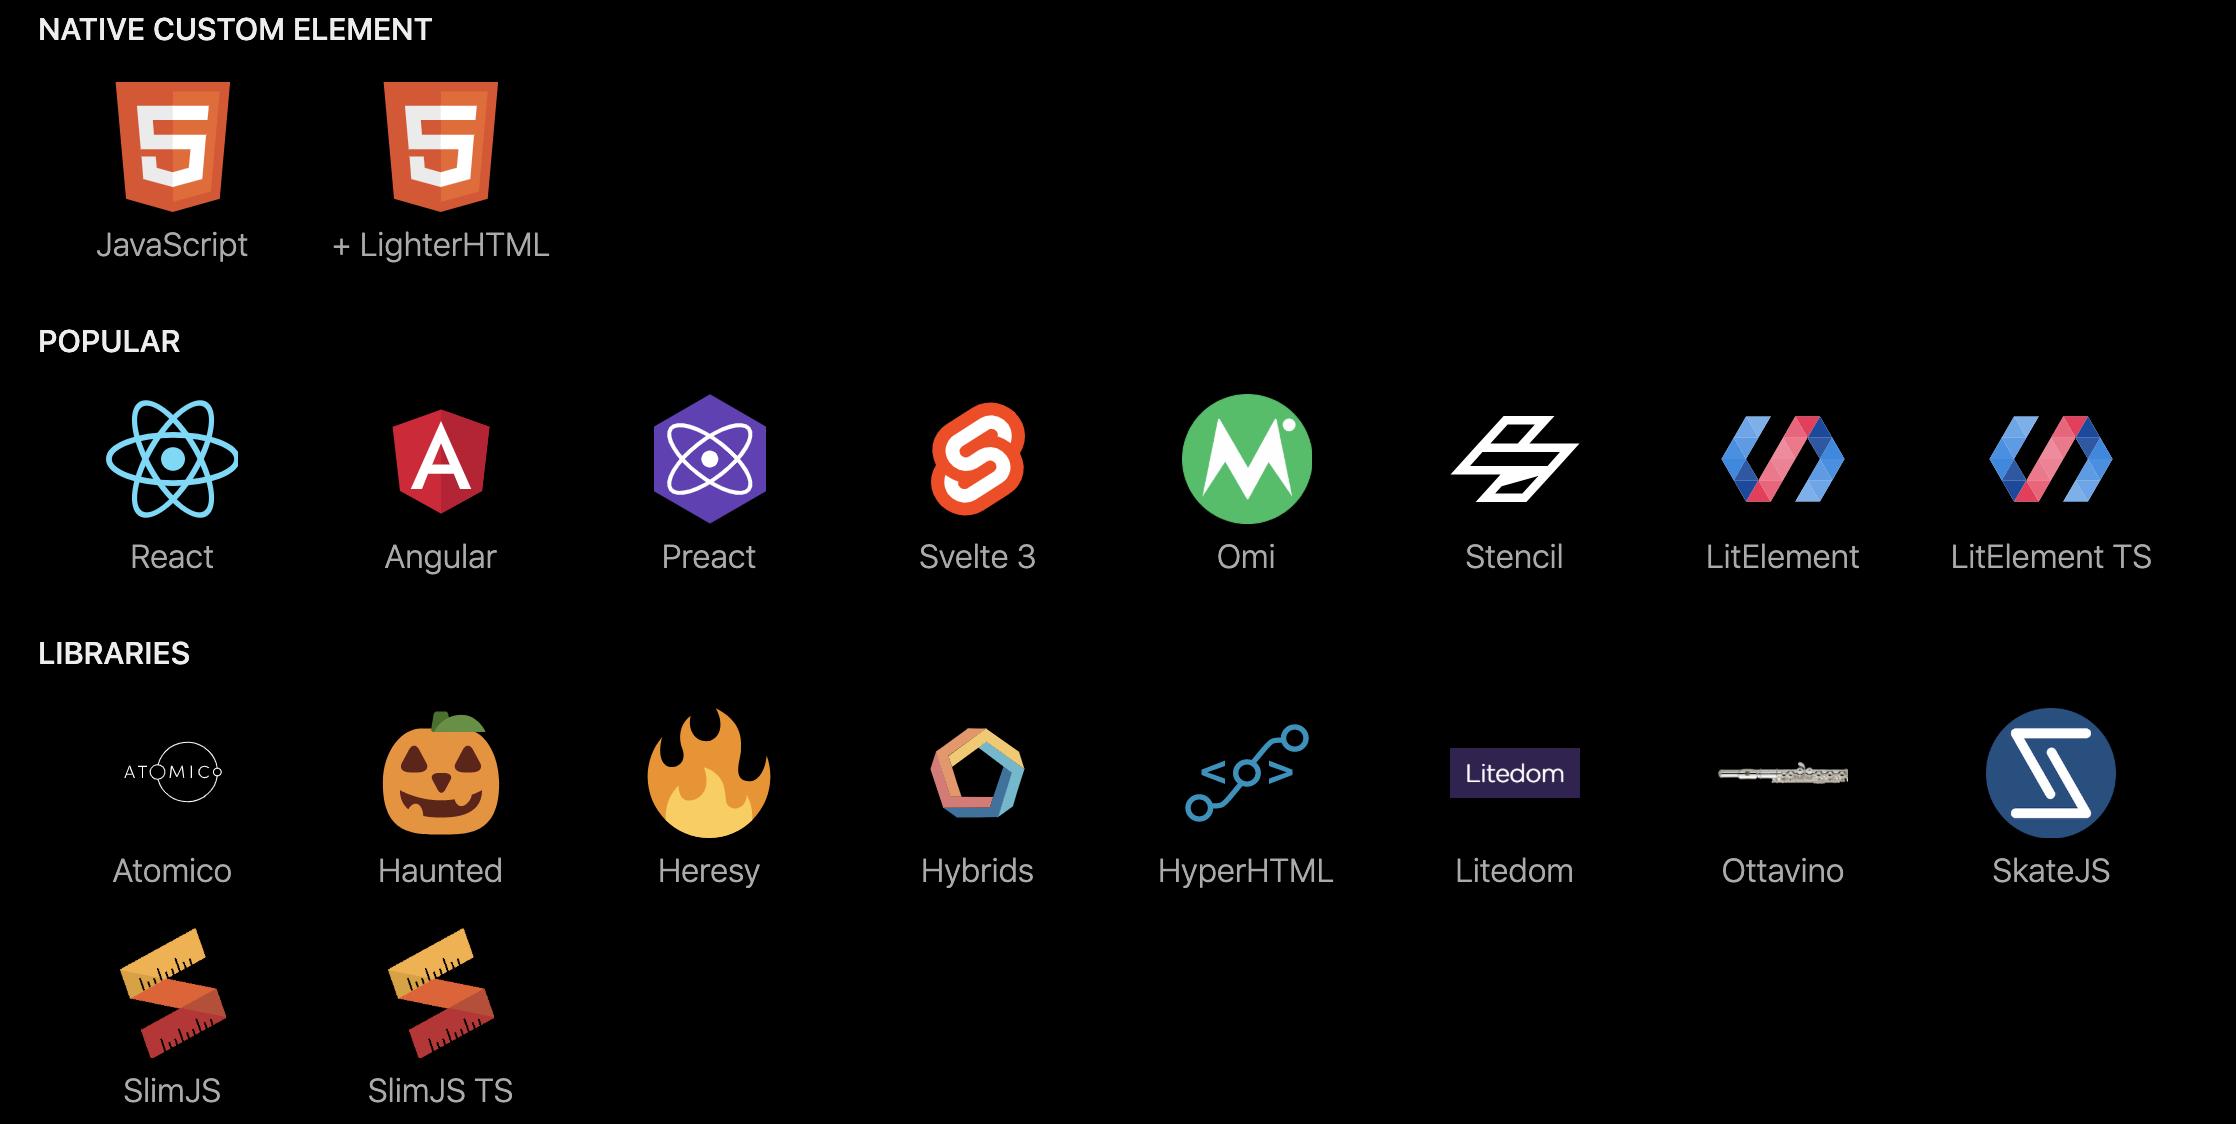 前端周报:Android 10 发布;PHP提议创建P++语言;Firefox 69发布;Babel 7.6.0发布